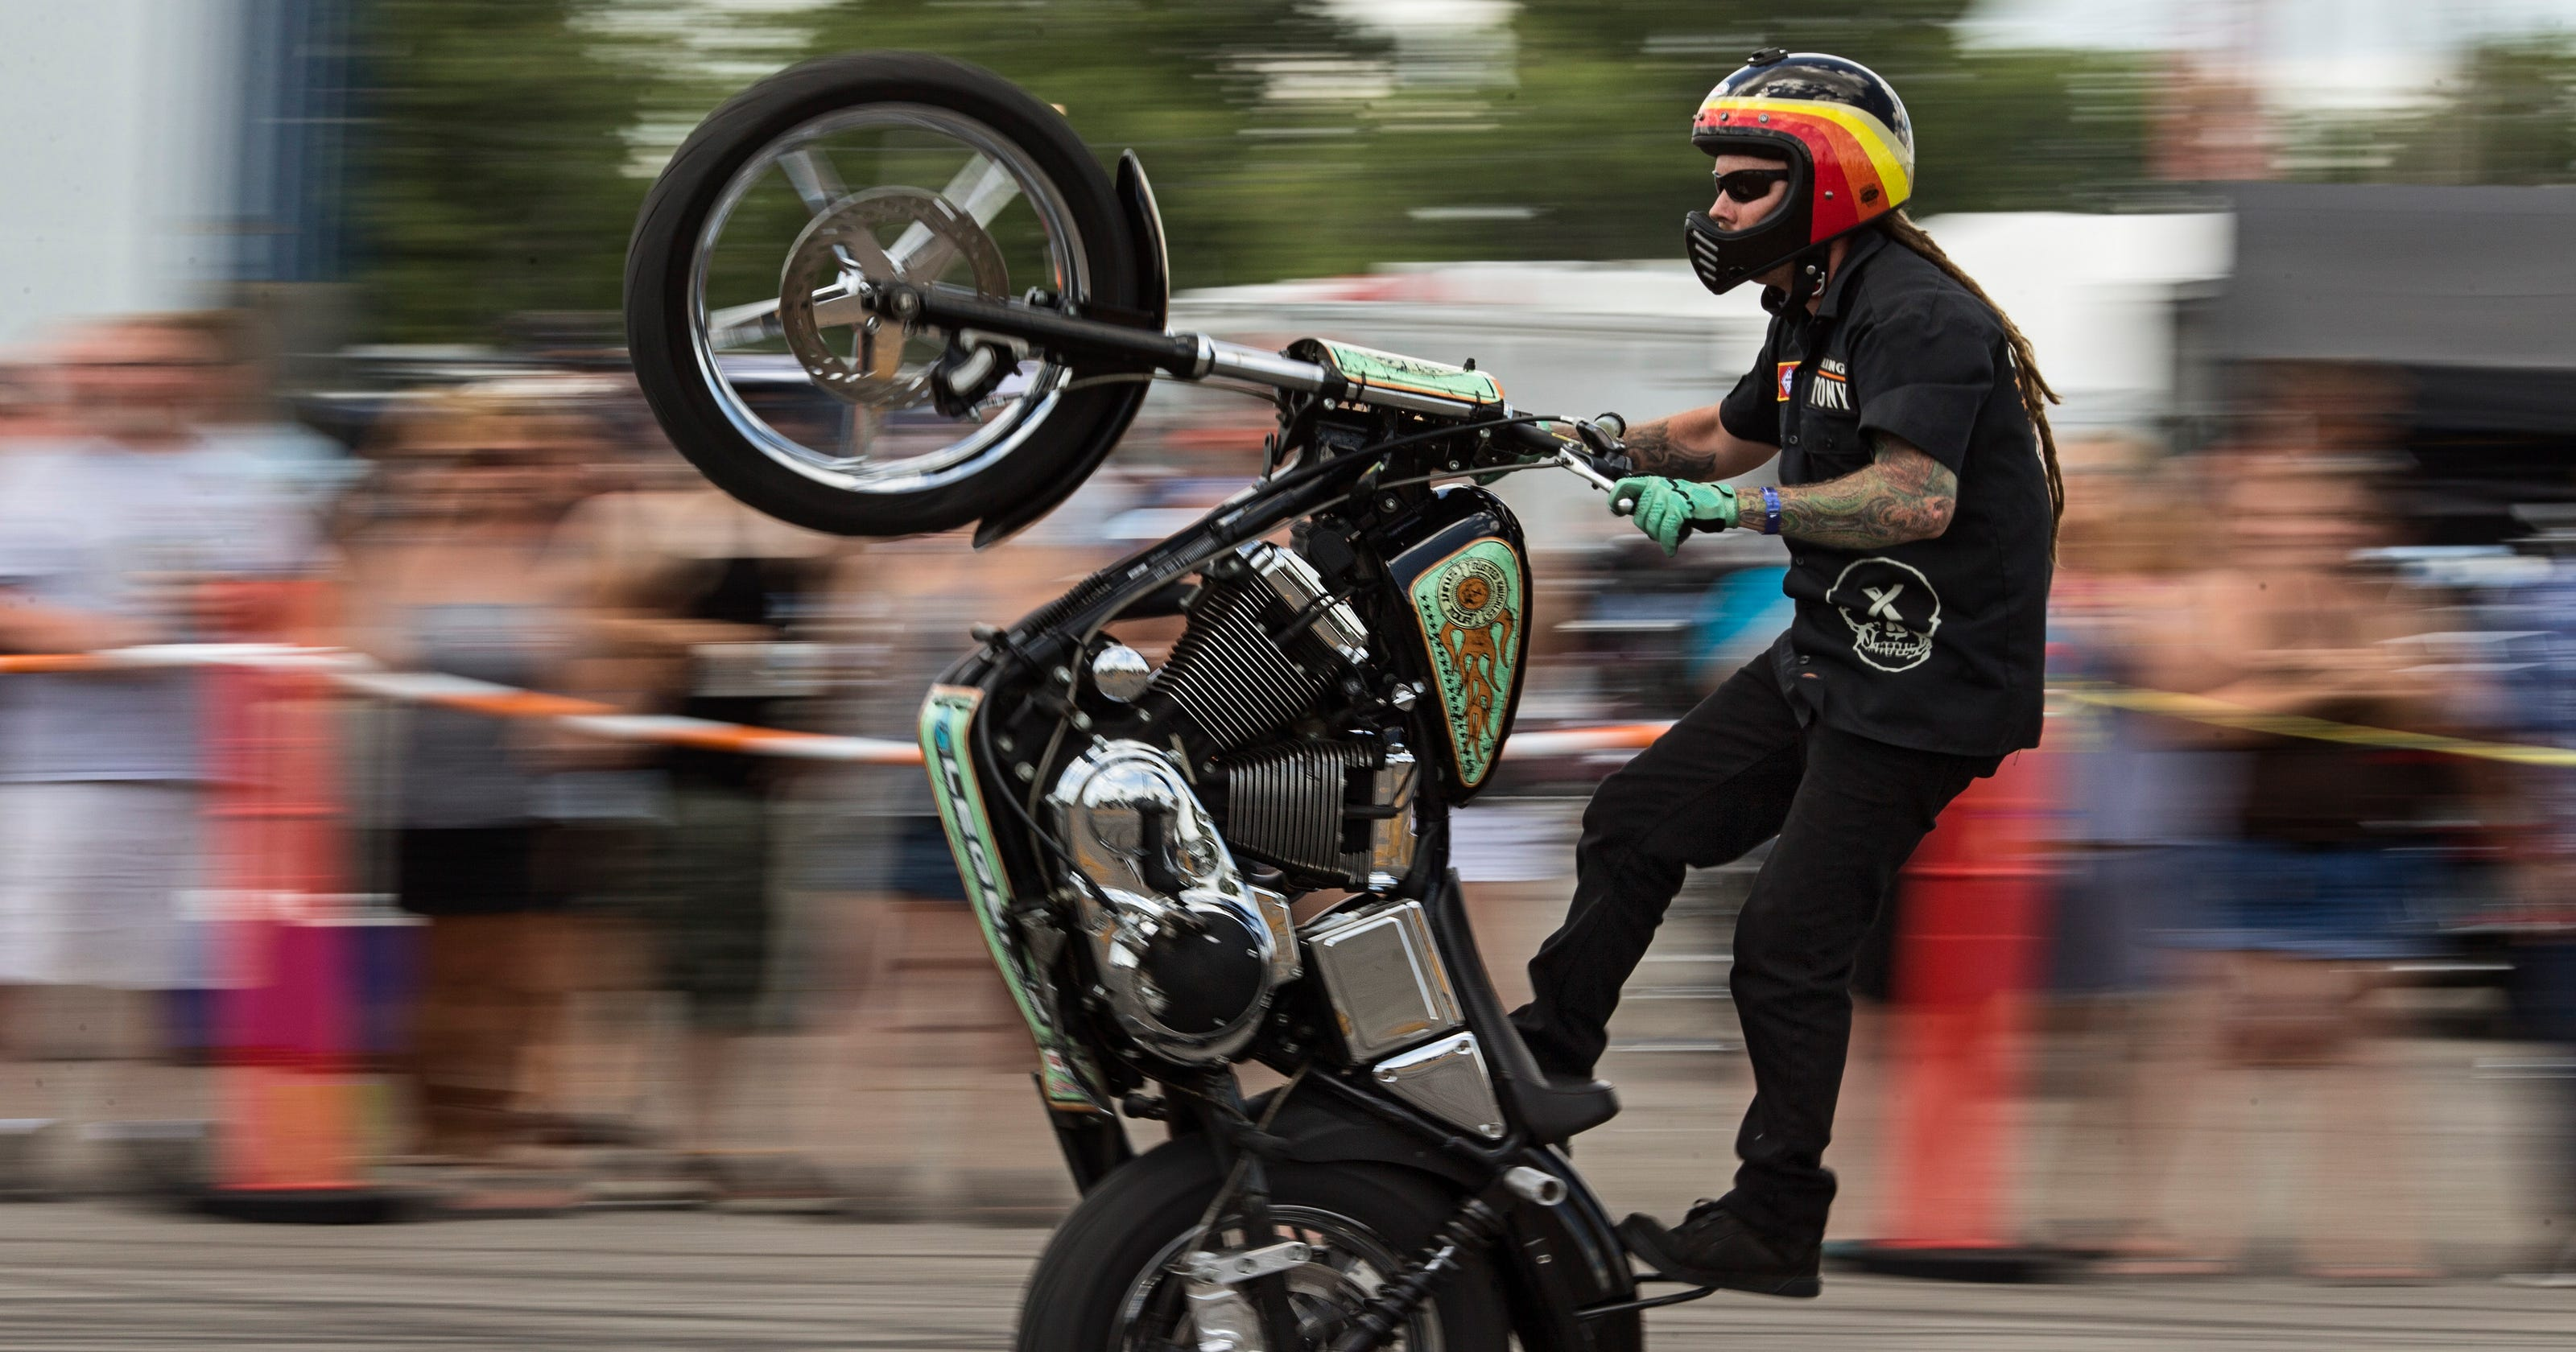 Sturgis bike rally erwachsene bilder — bild 6